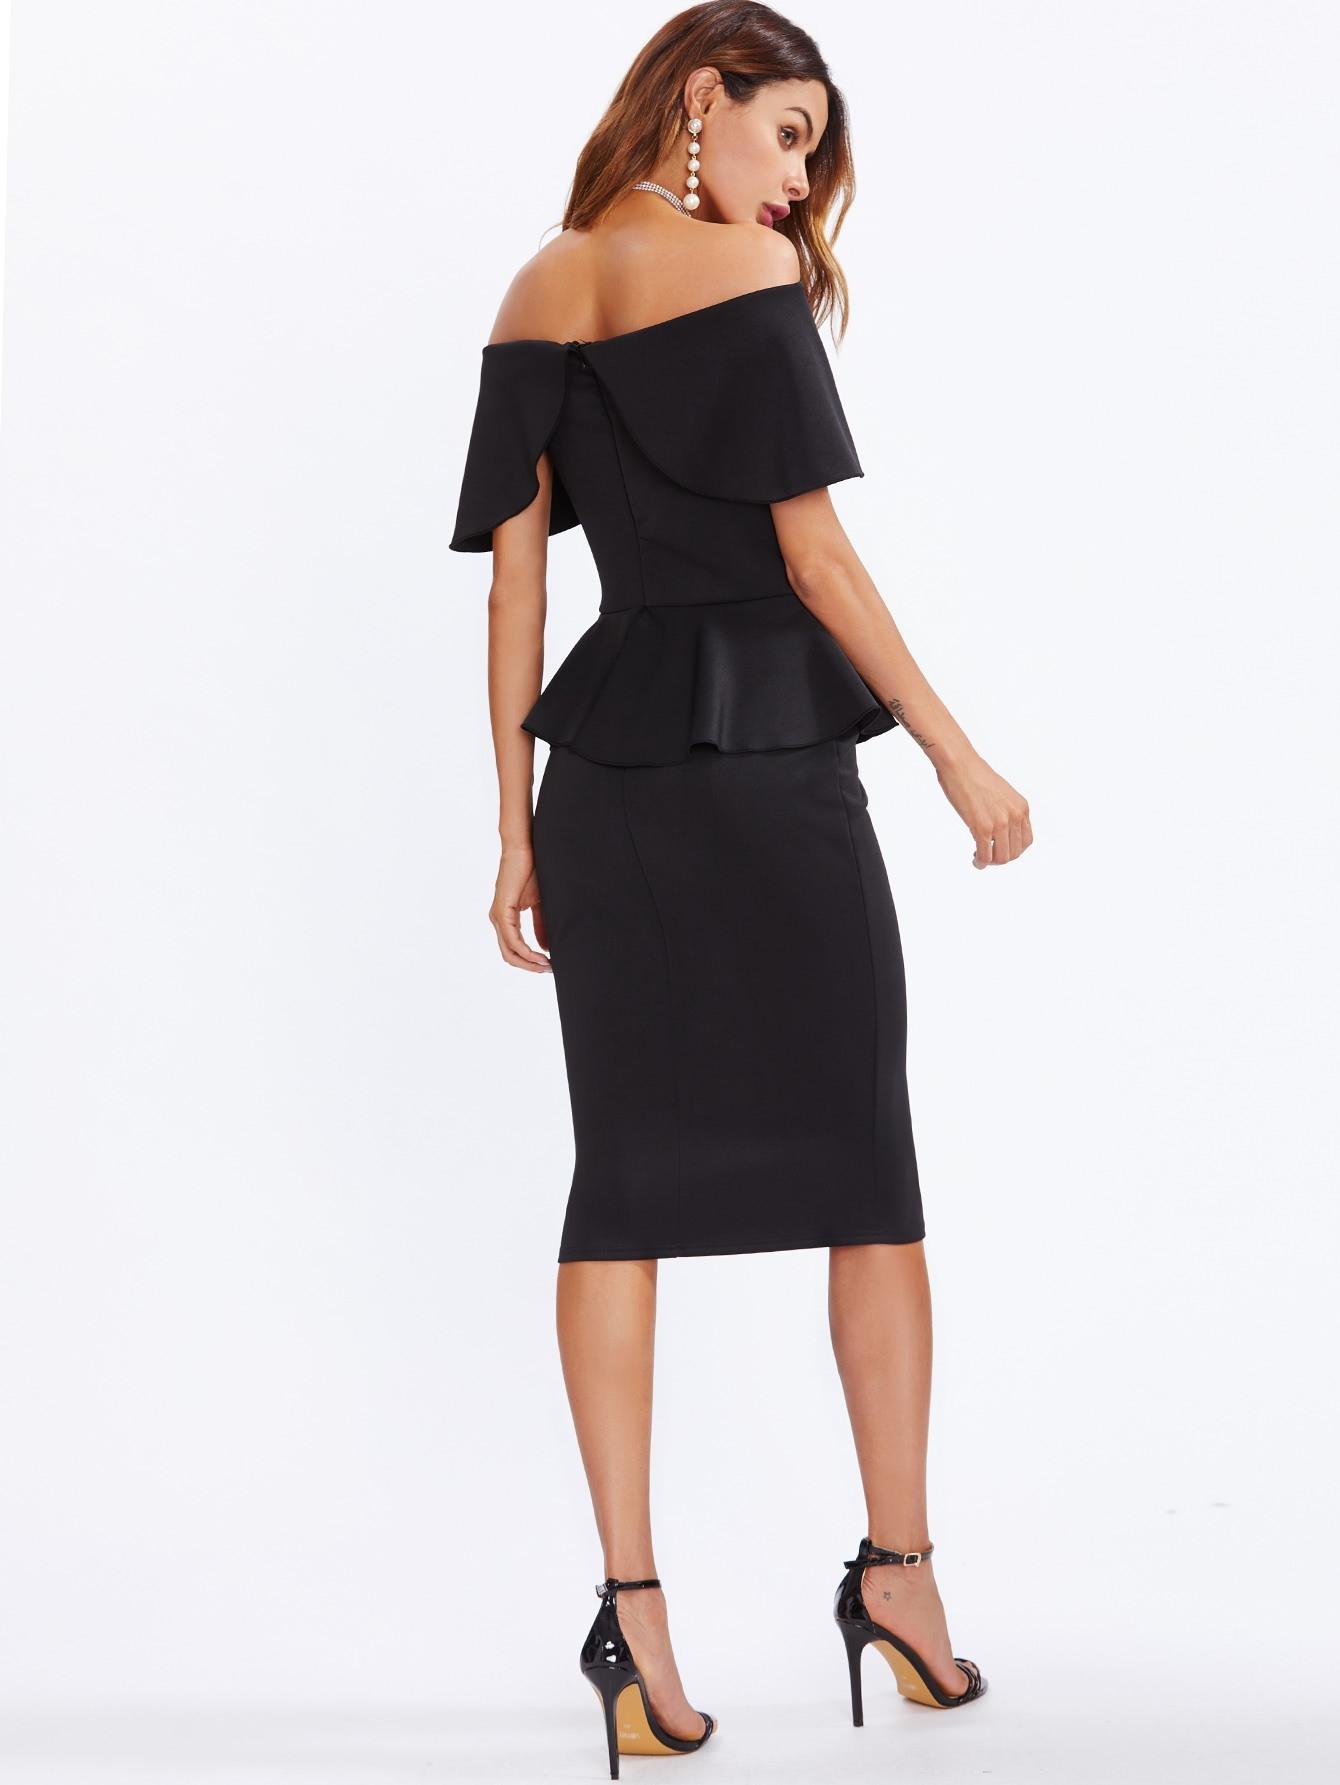 10 Fantastisch Elegante Kleider Knielang Bester Preis13 Leicht Elegante Kleider Knielang Spezialgebiet